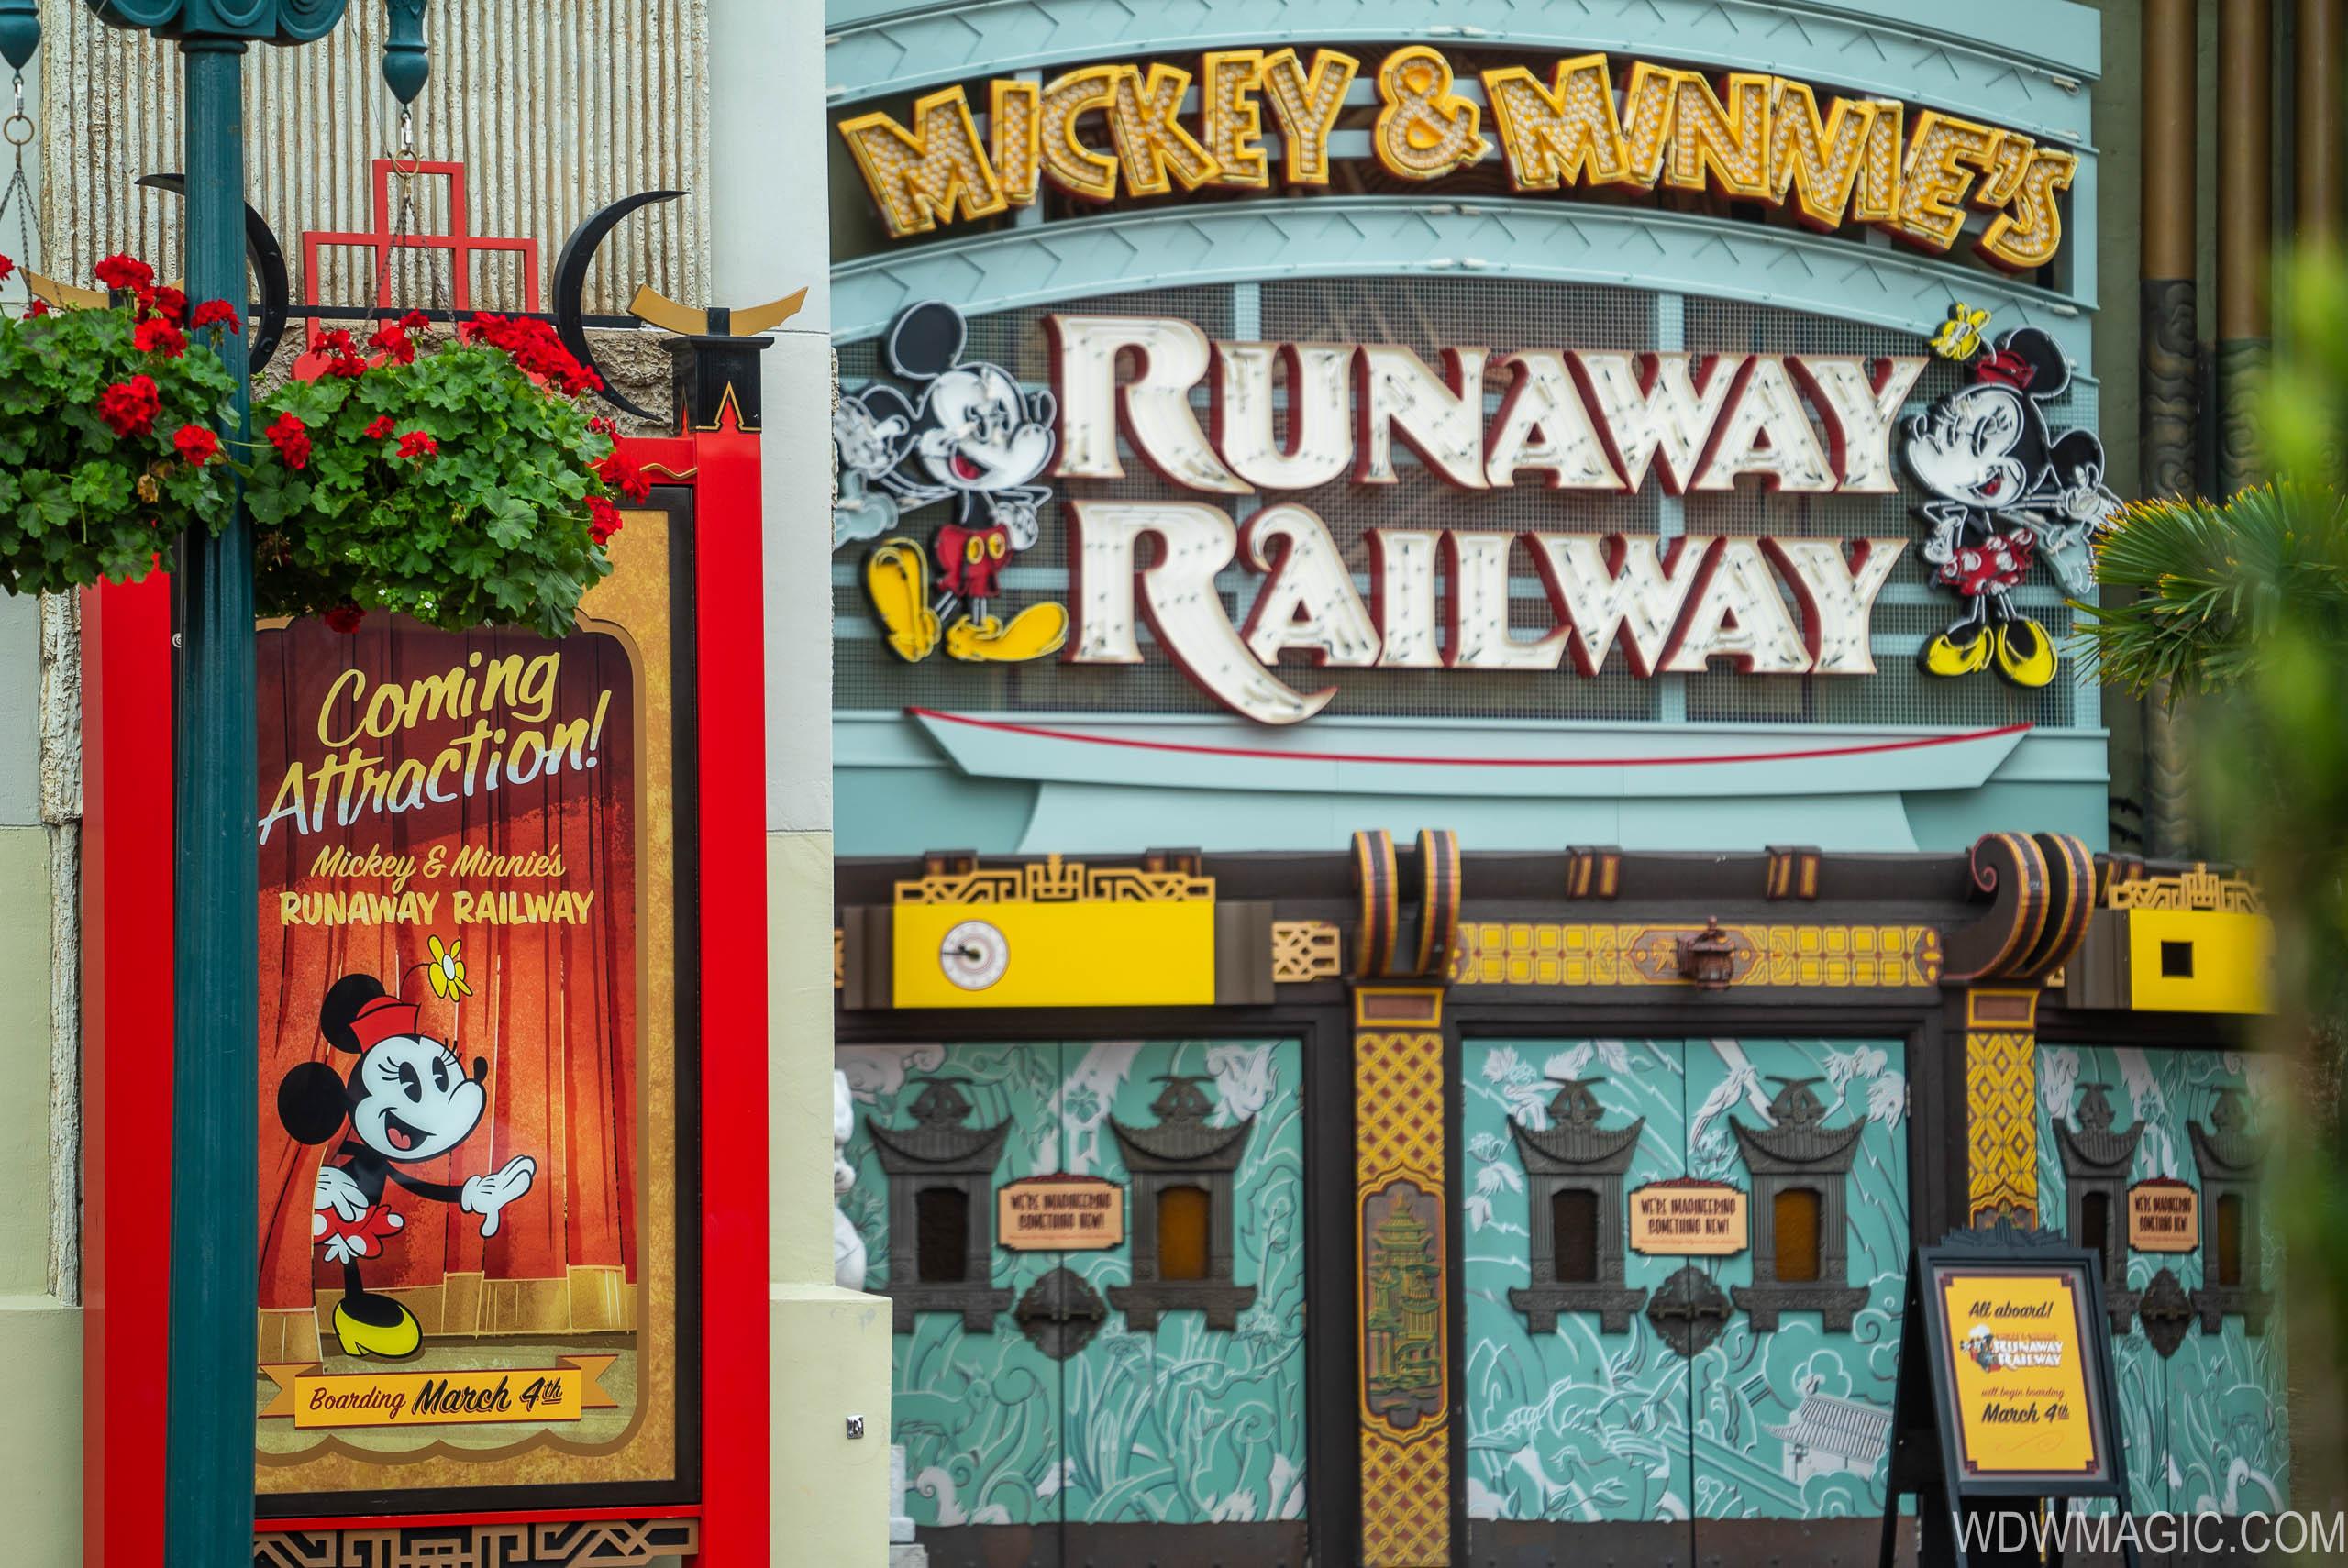 Mickey and Minnie's Runaway Railway News